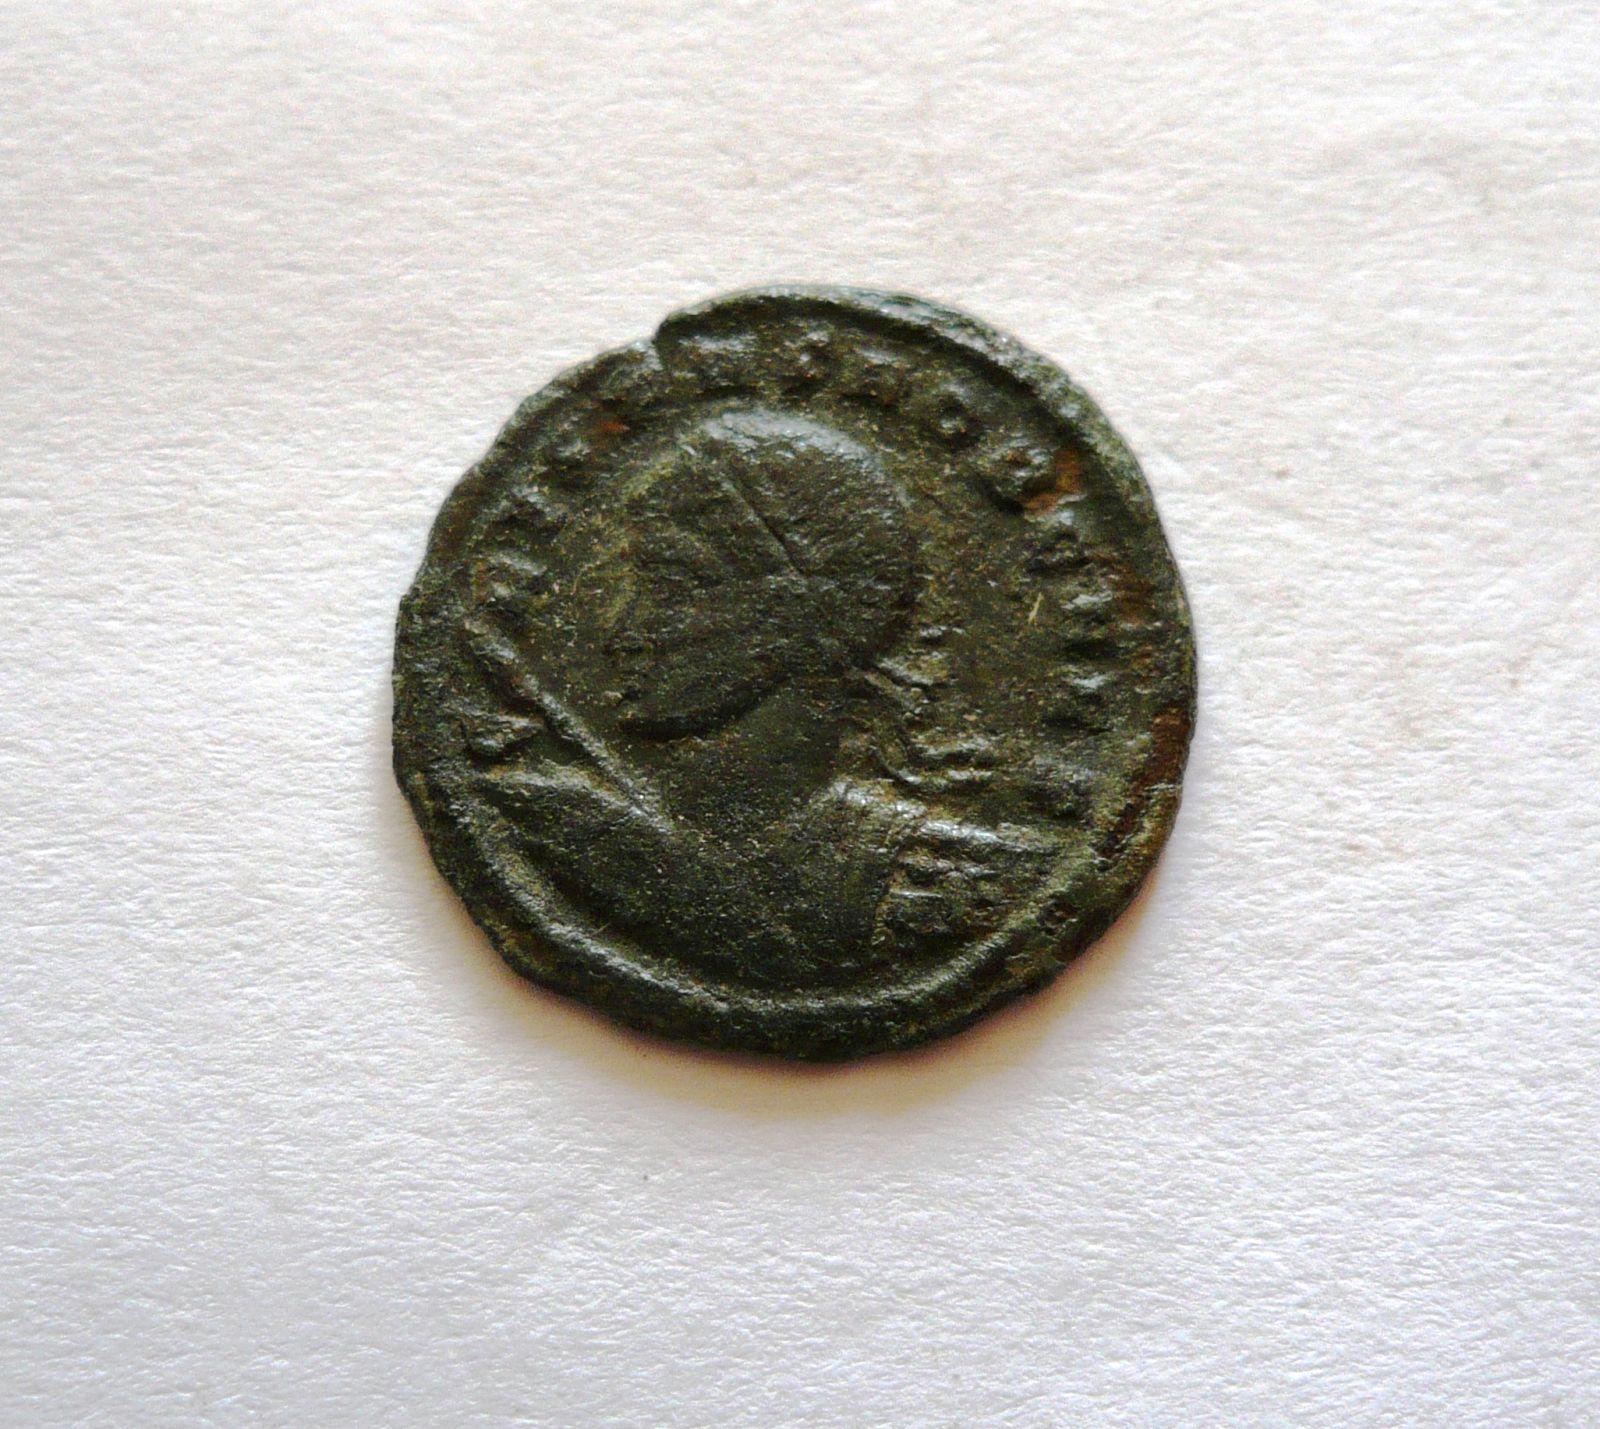 AE-centenionalis, Crispus, 2 vojáci, 316-26, Řím-císařství